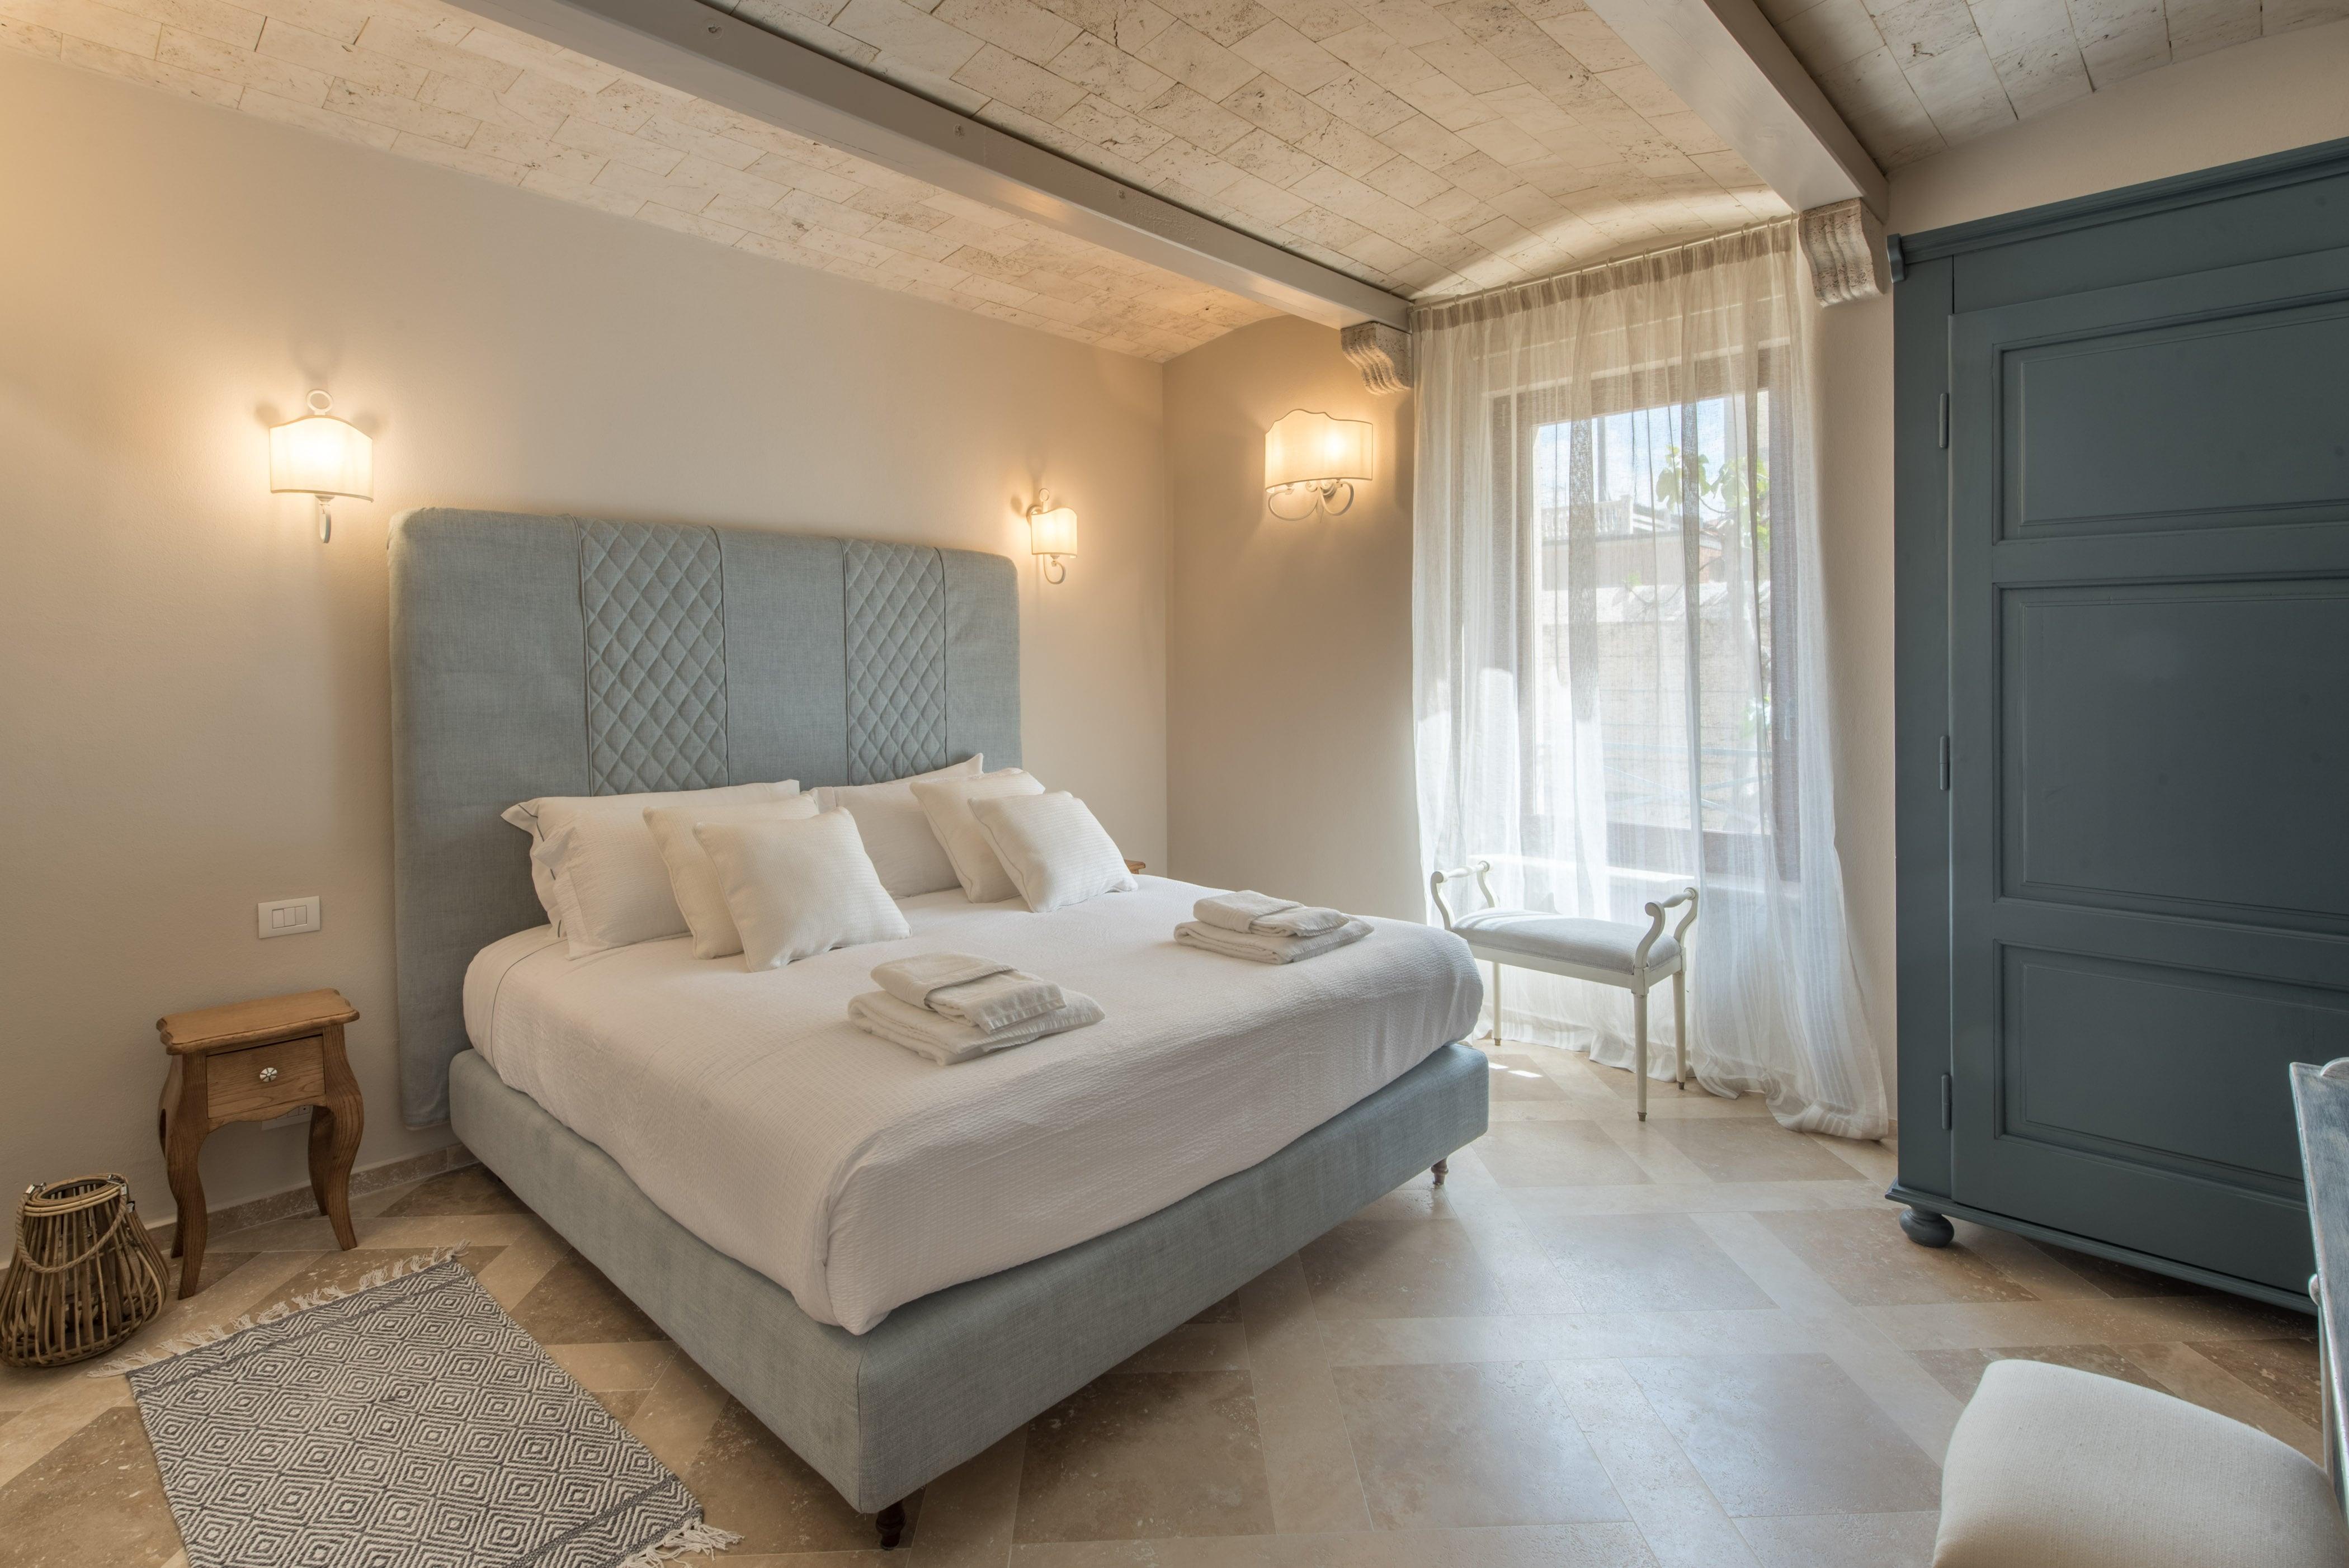 Villa Galatea ~ Beachfront home in San Vincenzo, Tuscany